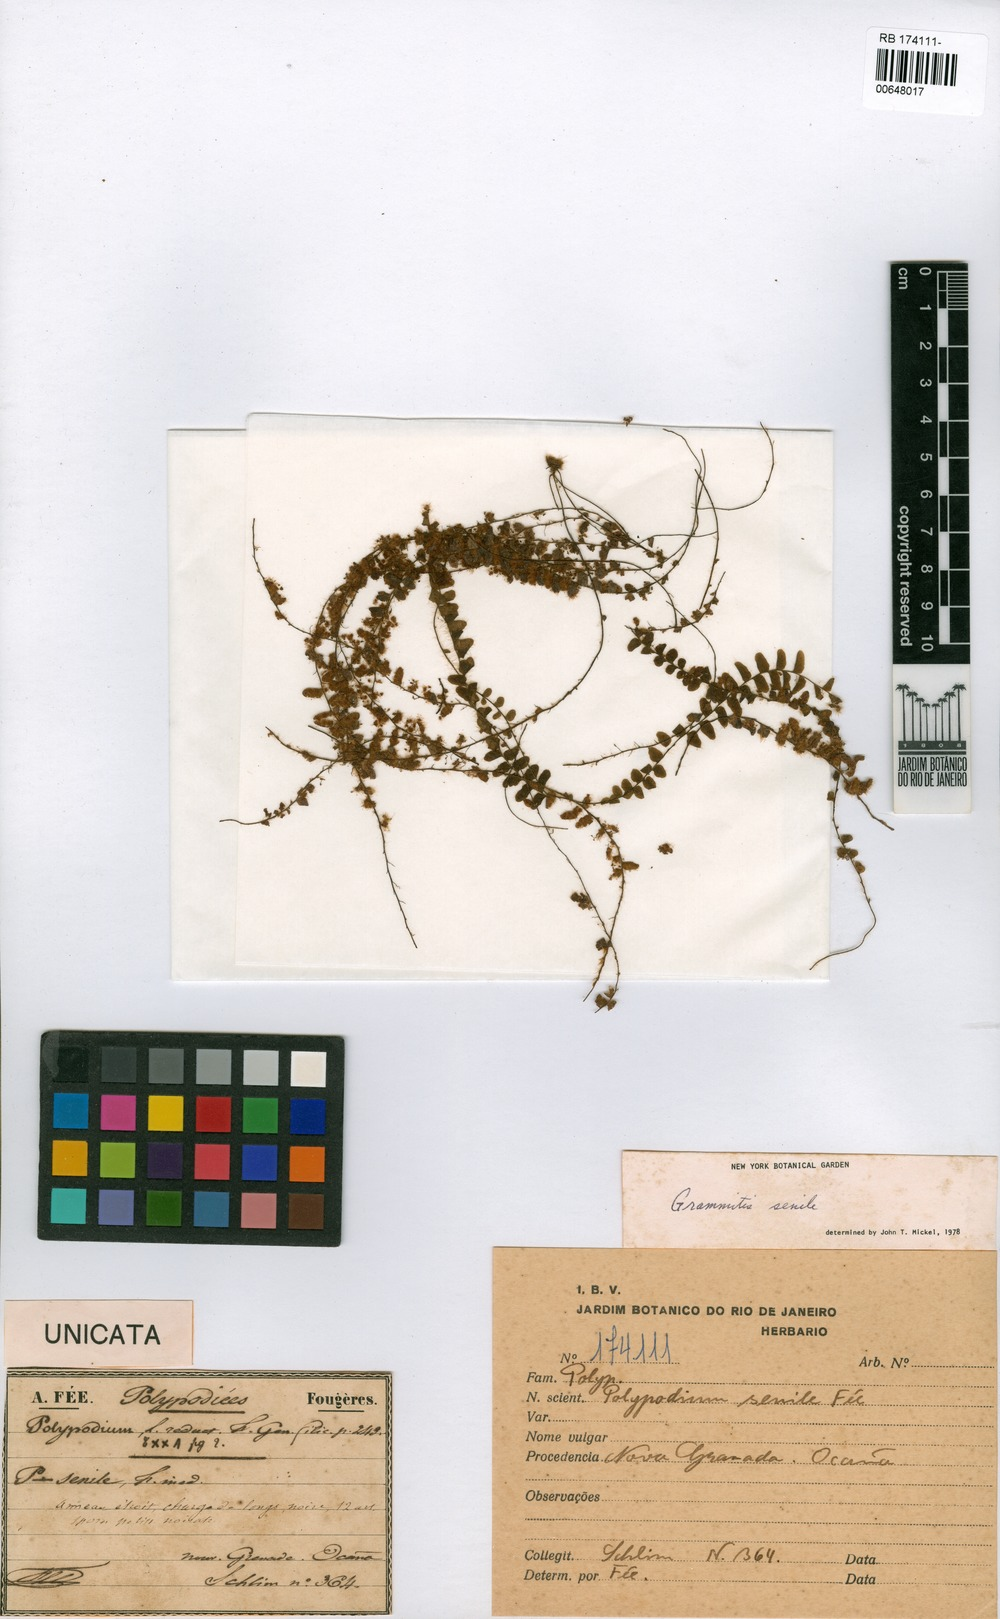 Grammitis senilis (Fée) C.V. Morton [family POLYPODIACEAE]